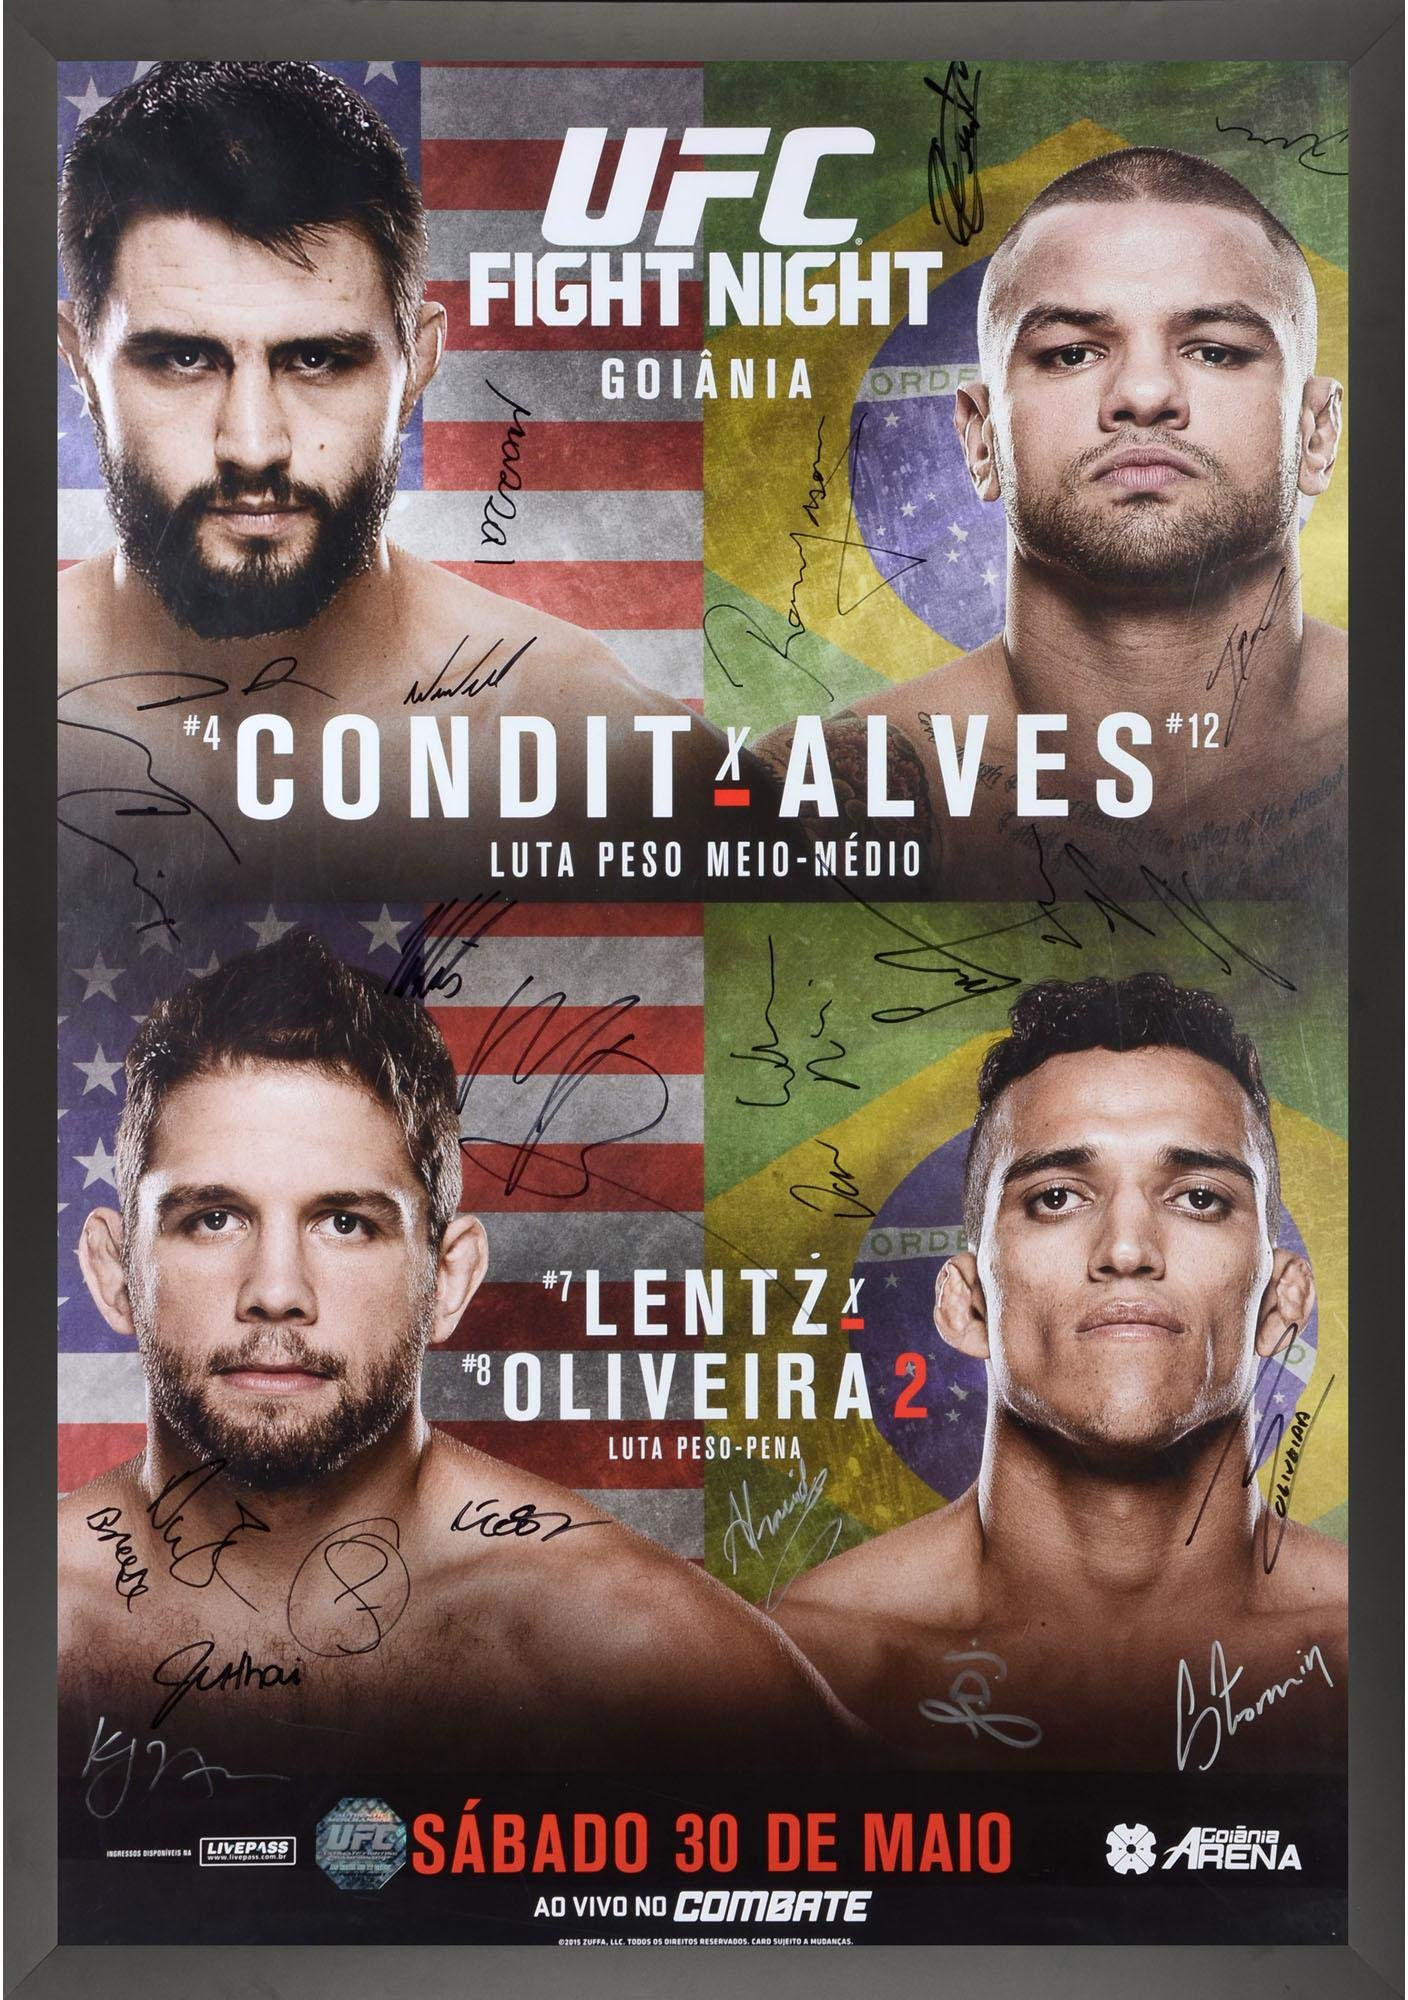 "UFC Fight Night 67 Condit vs. Alves Framed Autographed 27"" x 39"" 24 Signature Fight Poster Fanatics Authentic Certified"